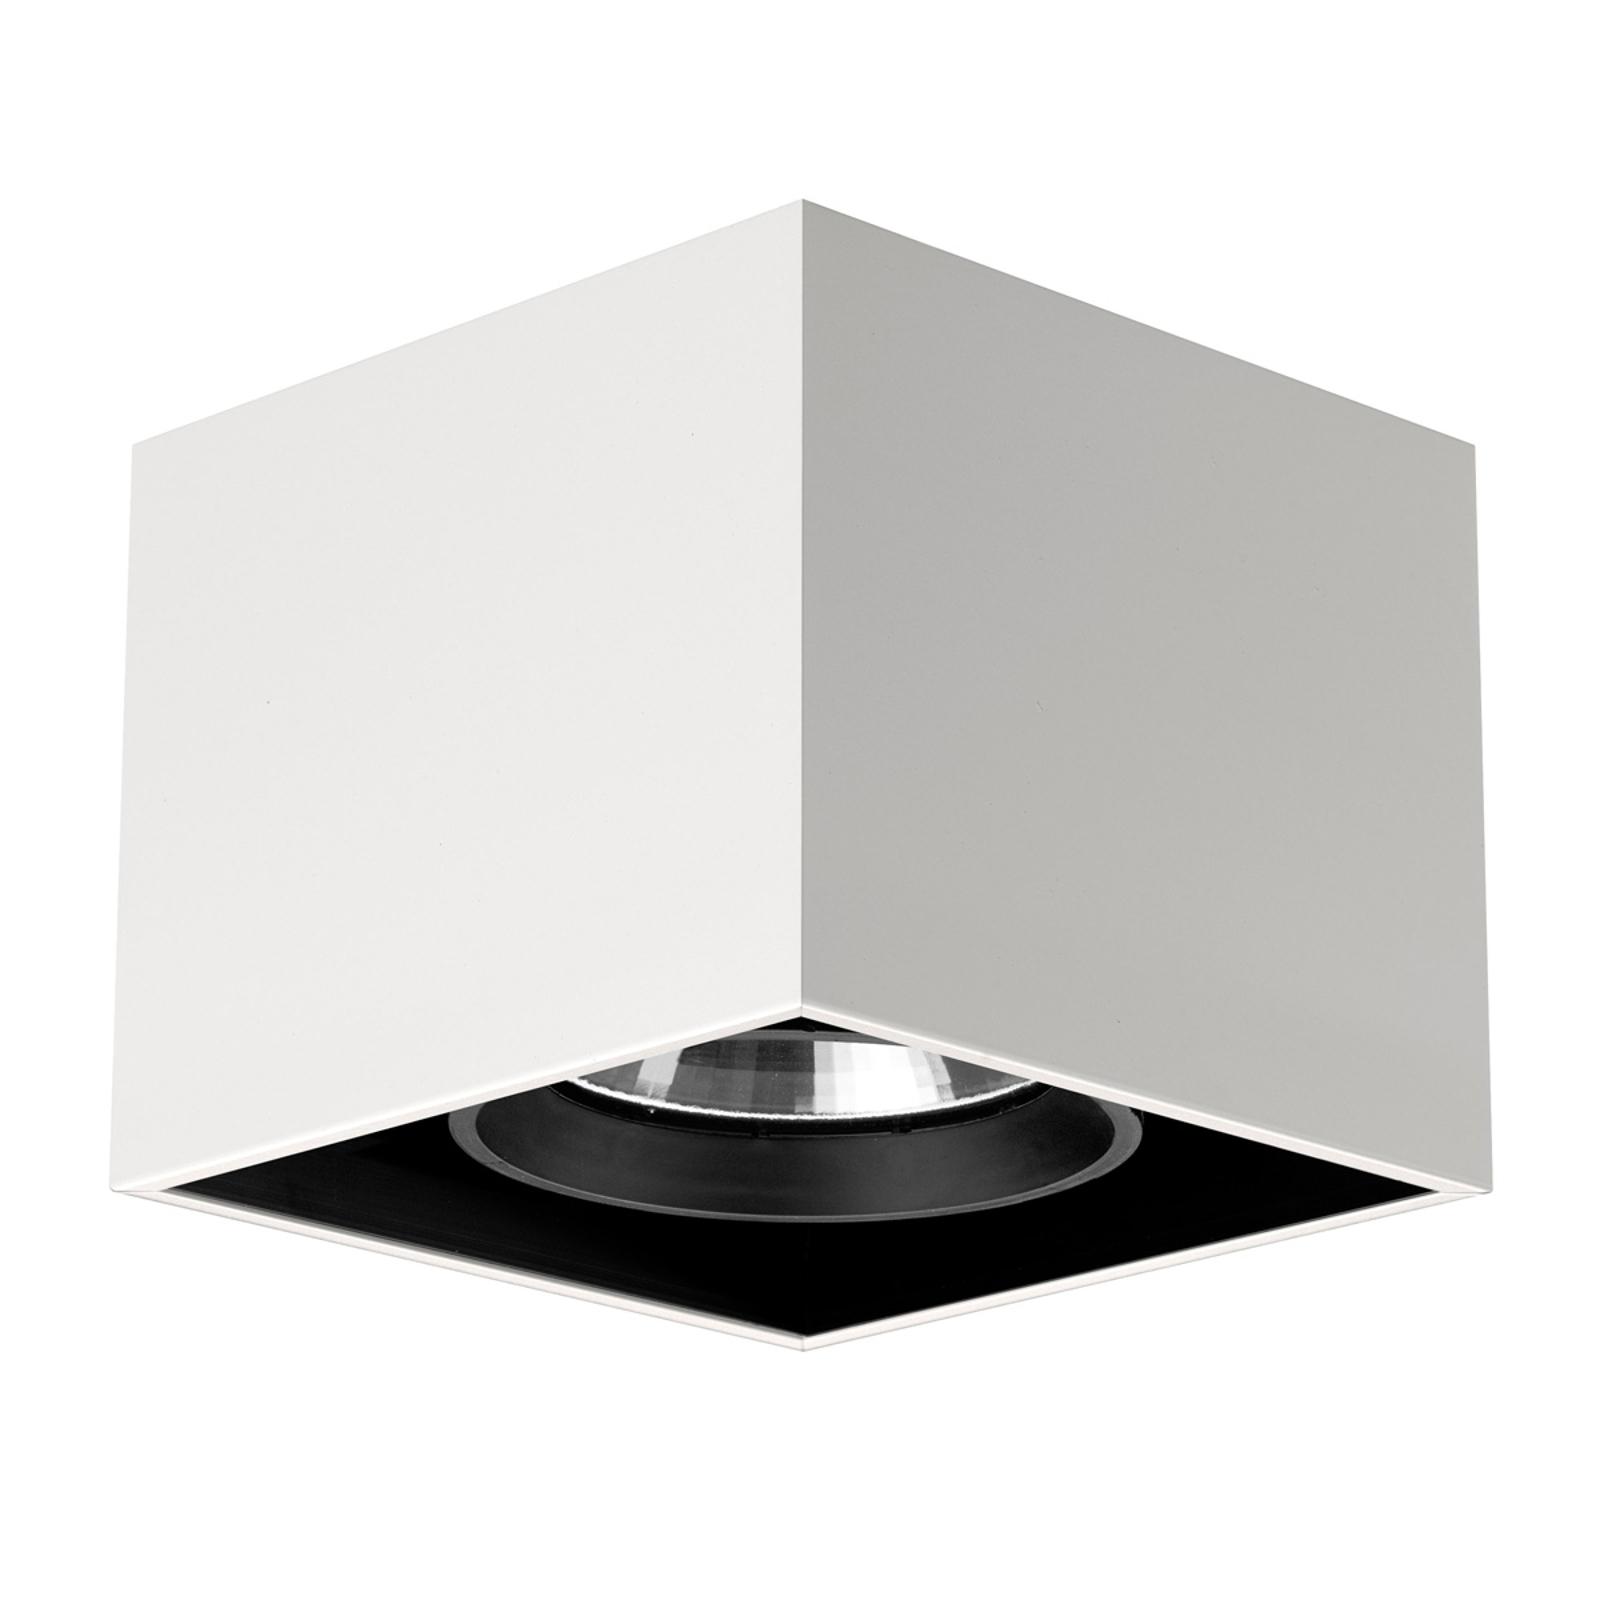 Compass Box - vierkante plafondlamp, wit